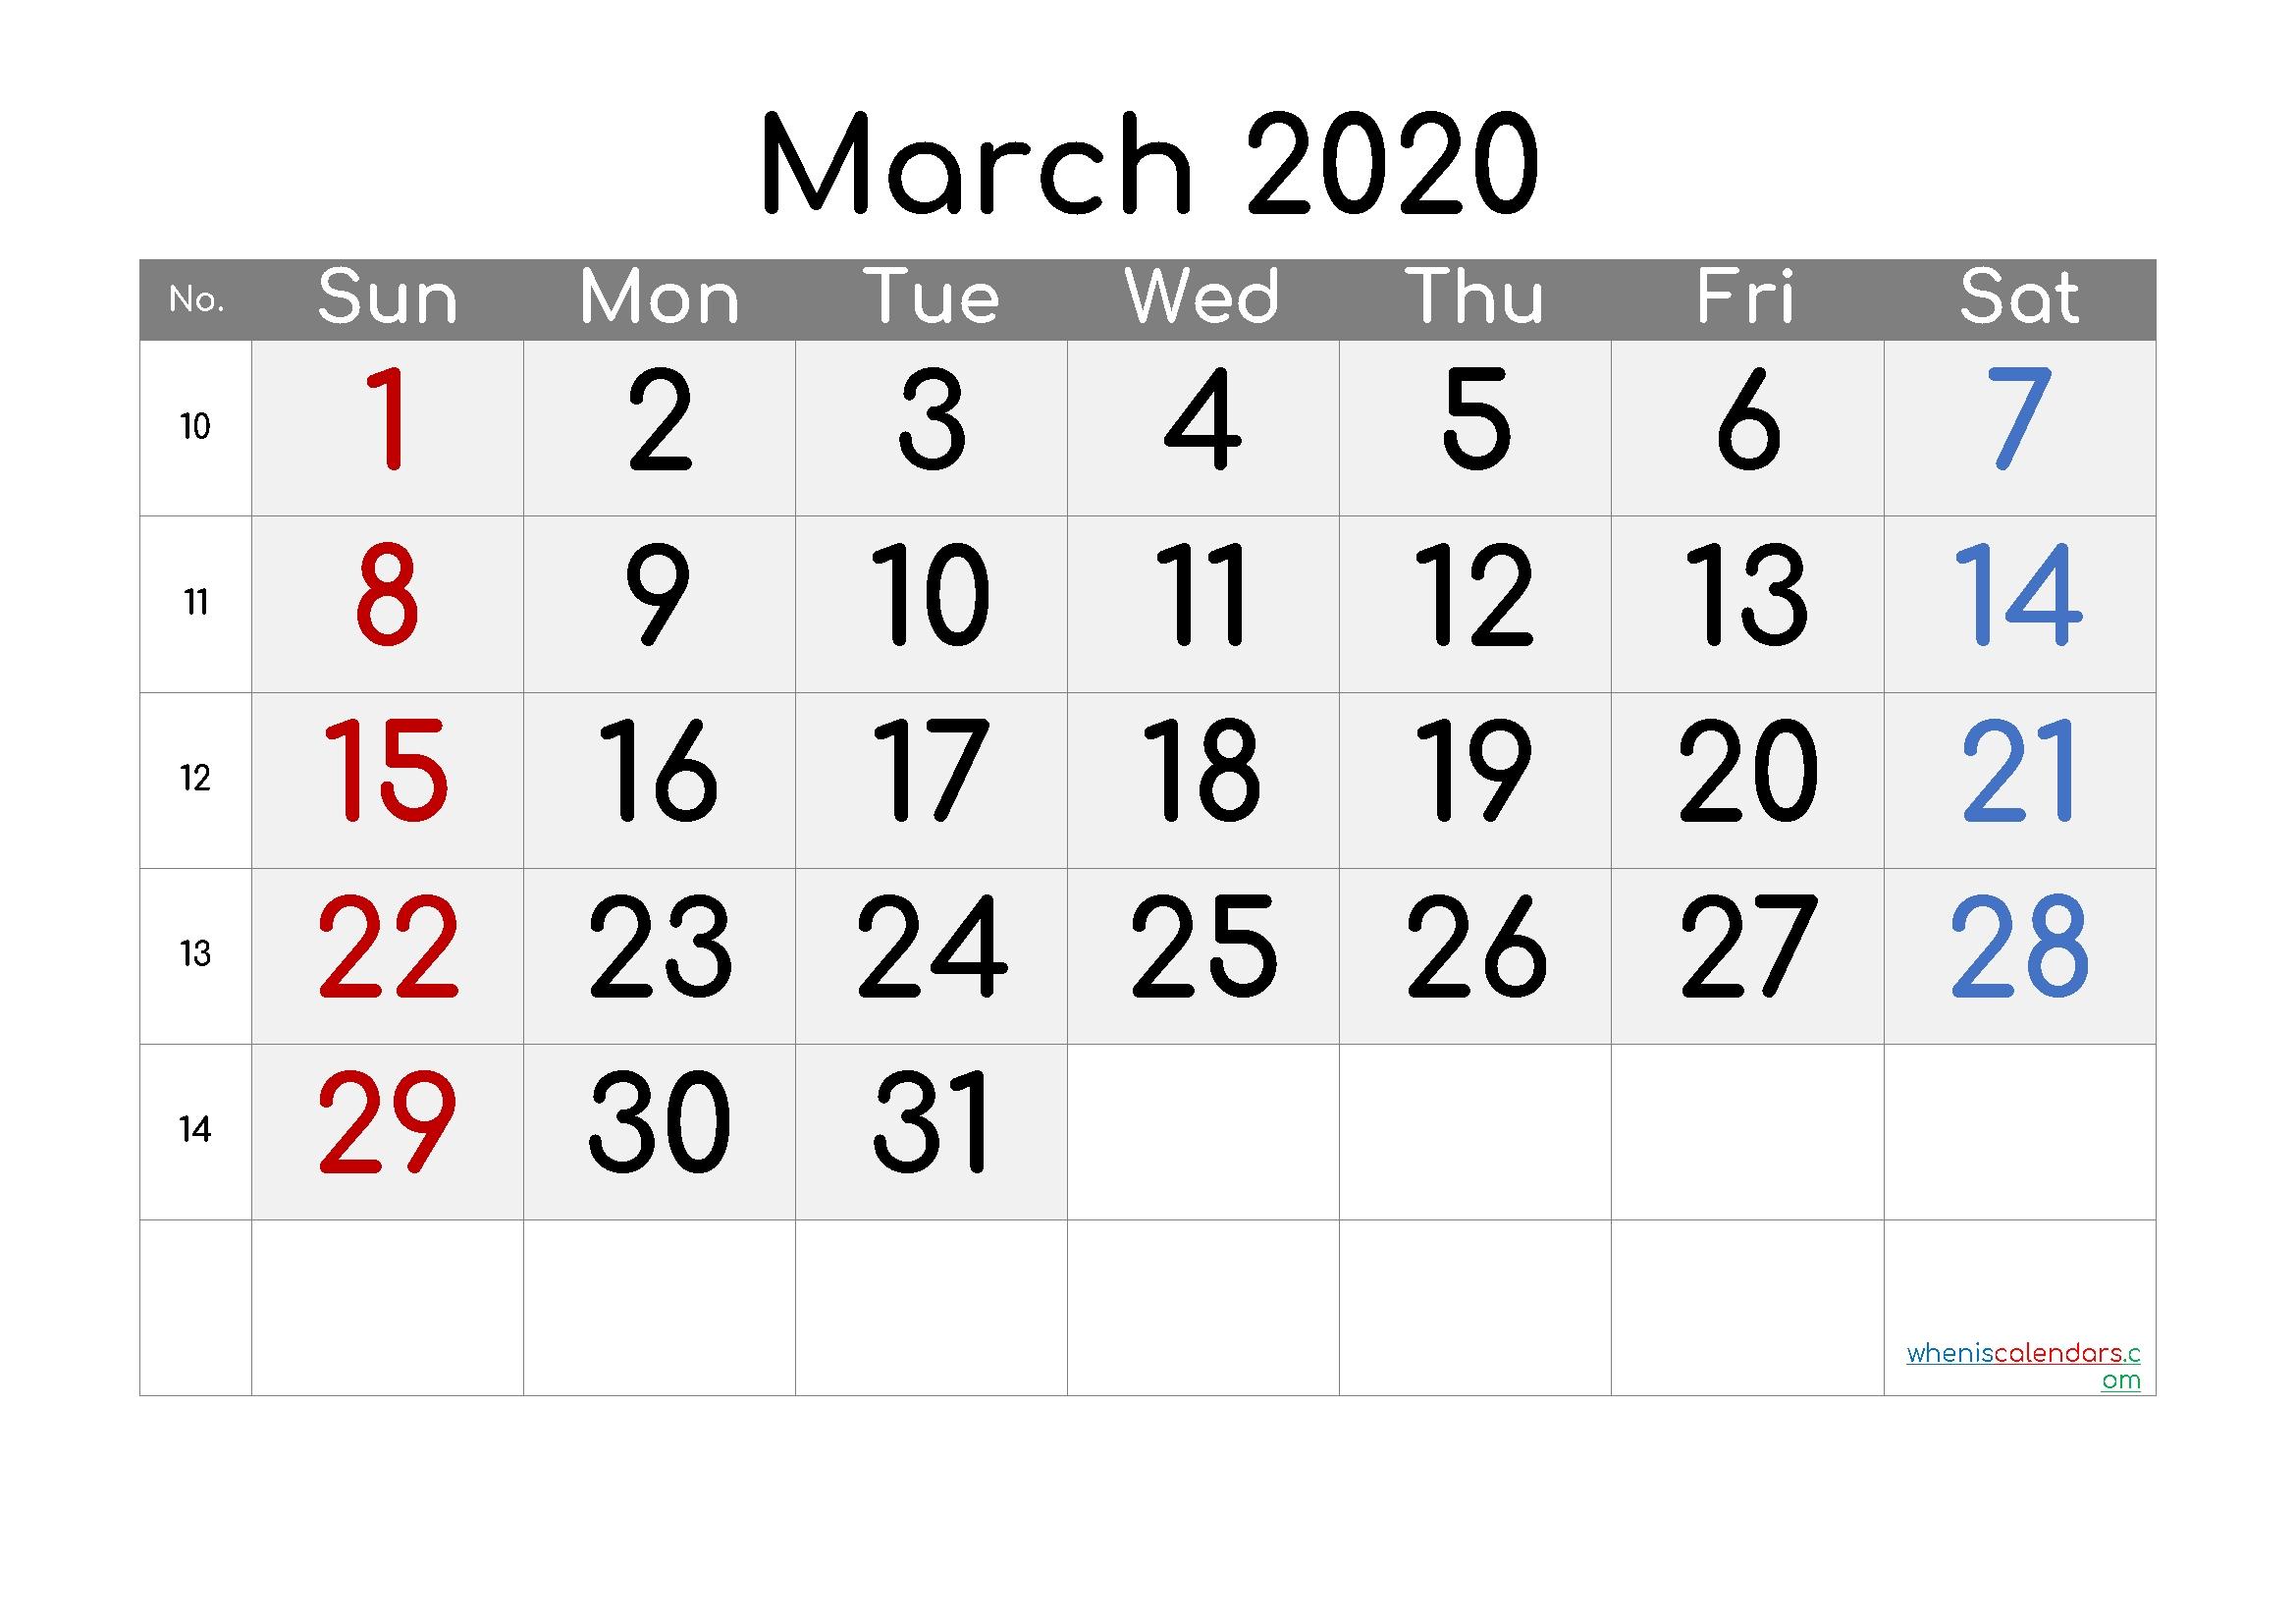 March 2020 Printable Calendar With Week Numbers - 6